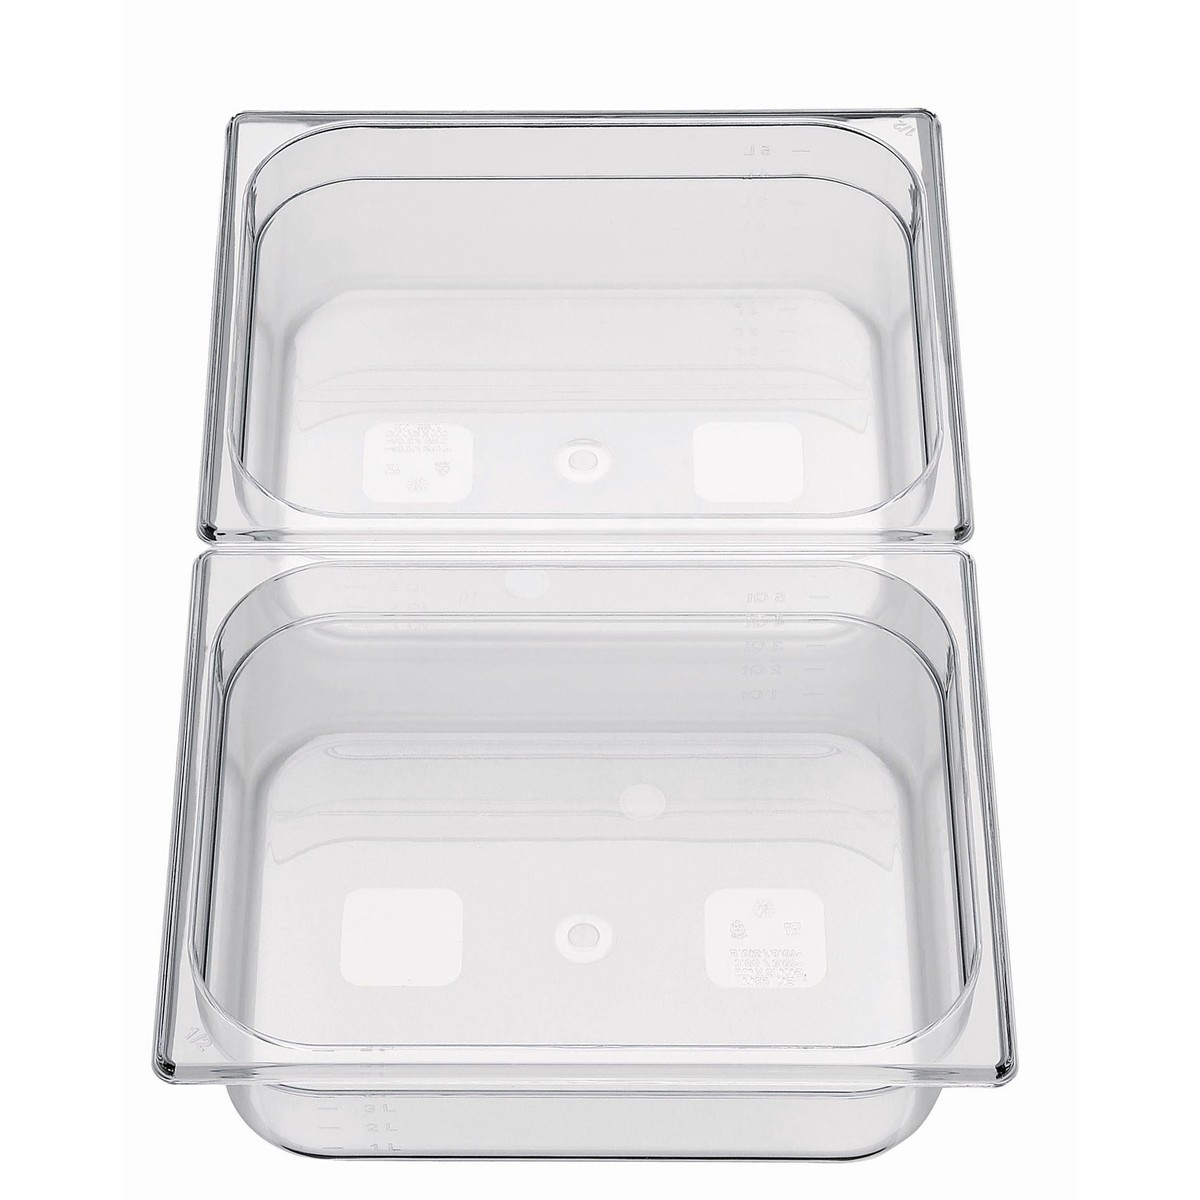 GN-Behälter 1/2 Polycarbonat 65mm